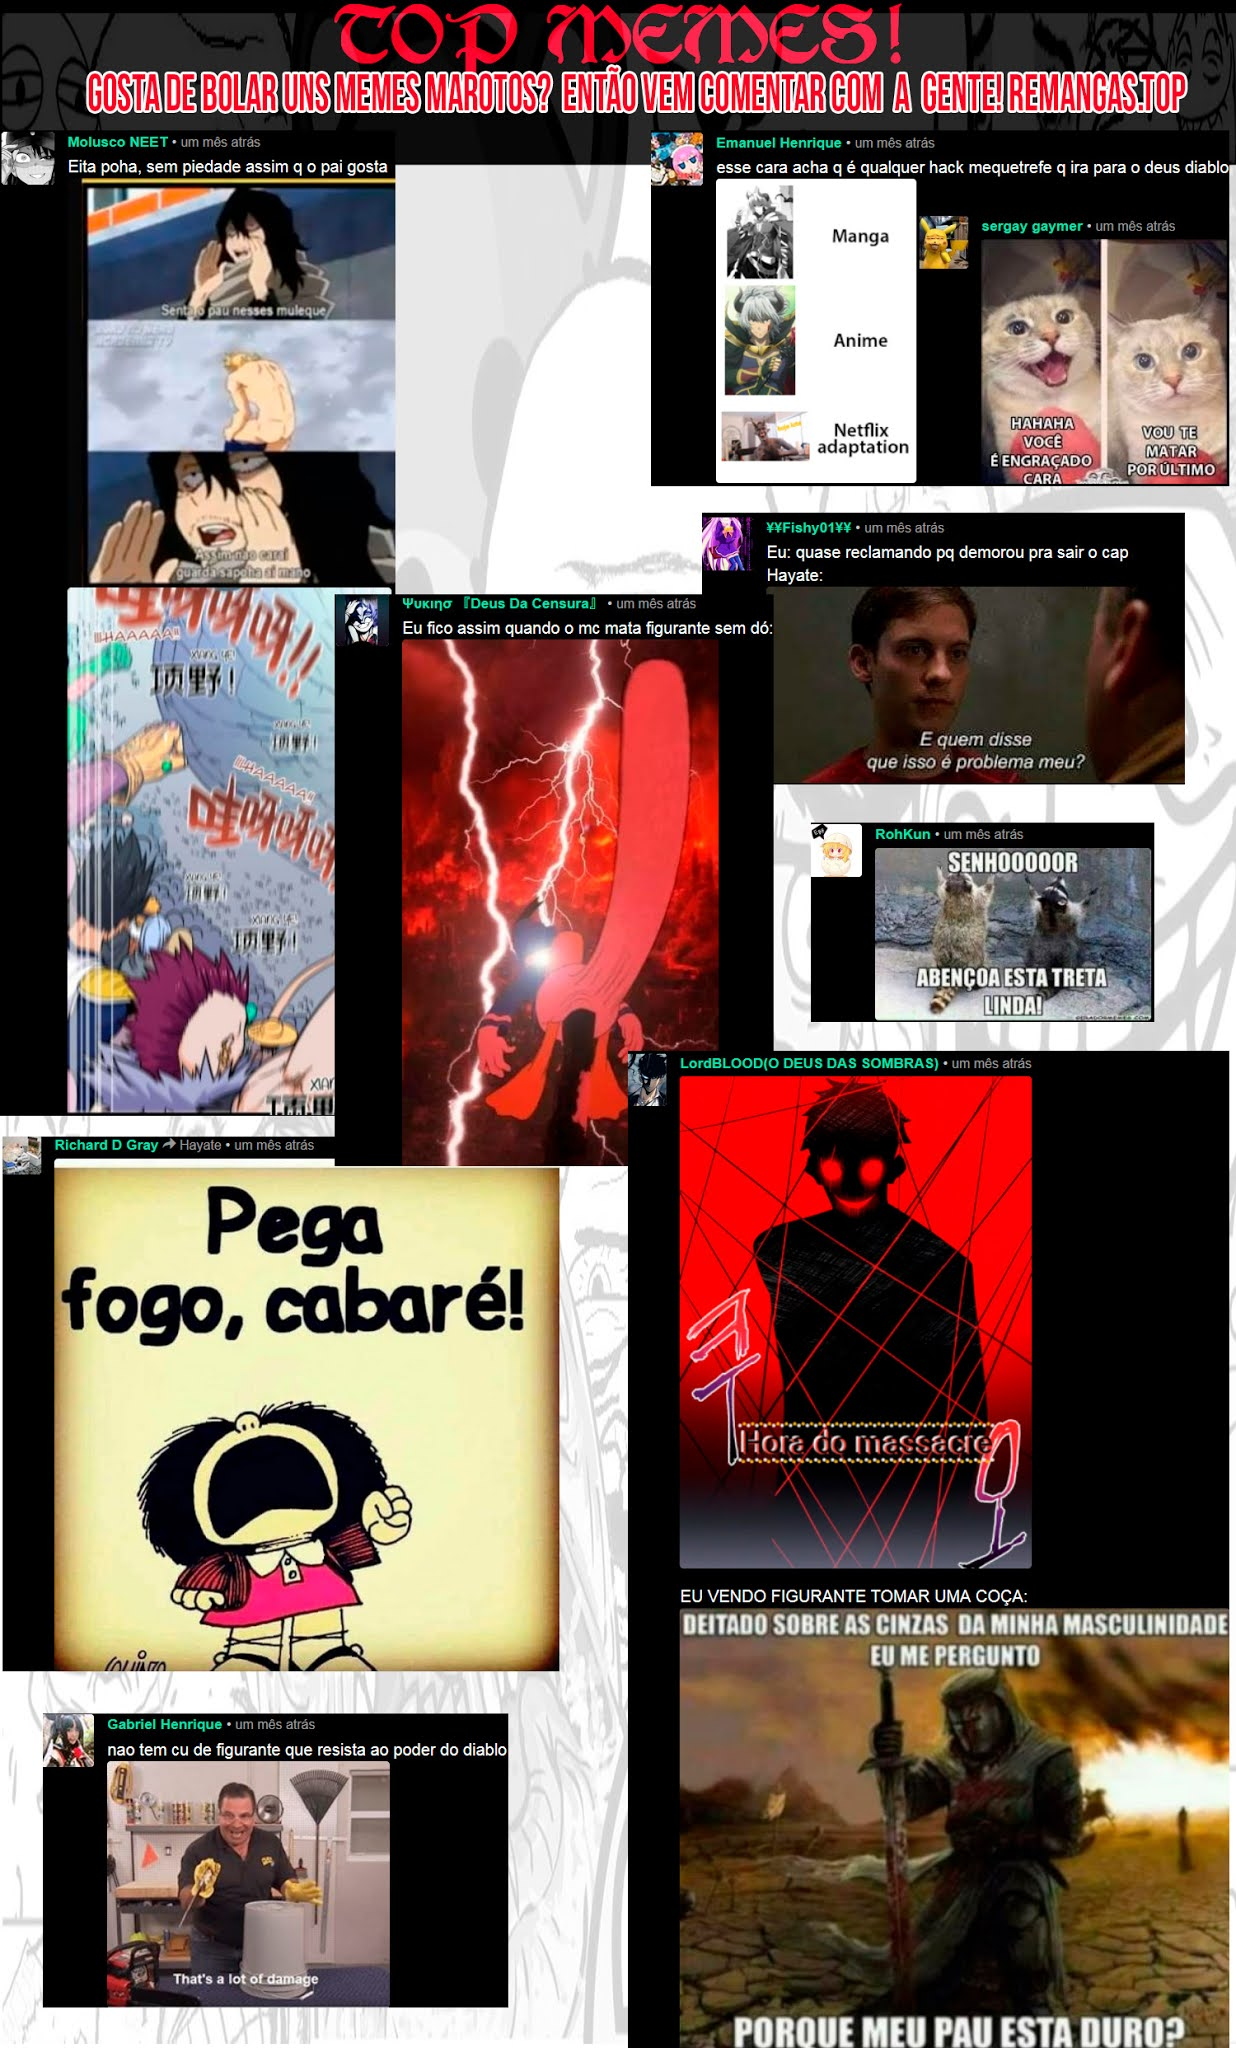 Isekai Maou to Shoukan Shoujo no Dorei Majutsu / How NOT To Summon a Demon Lord Mangá Online Capítulo 61 em Português PT-BR